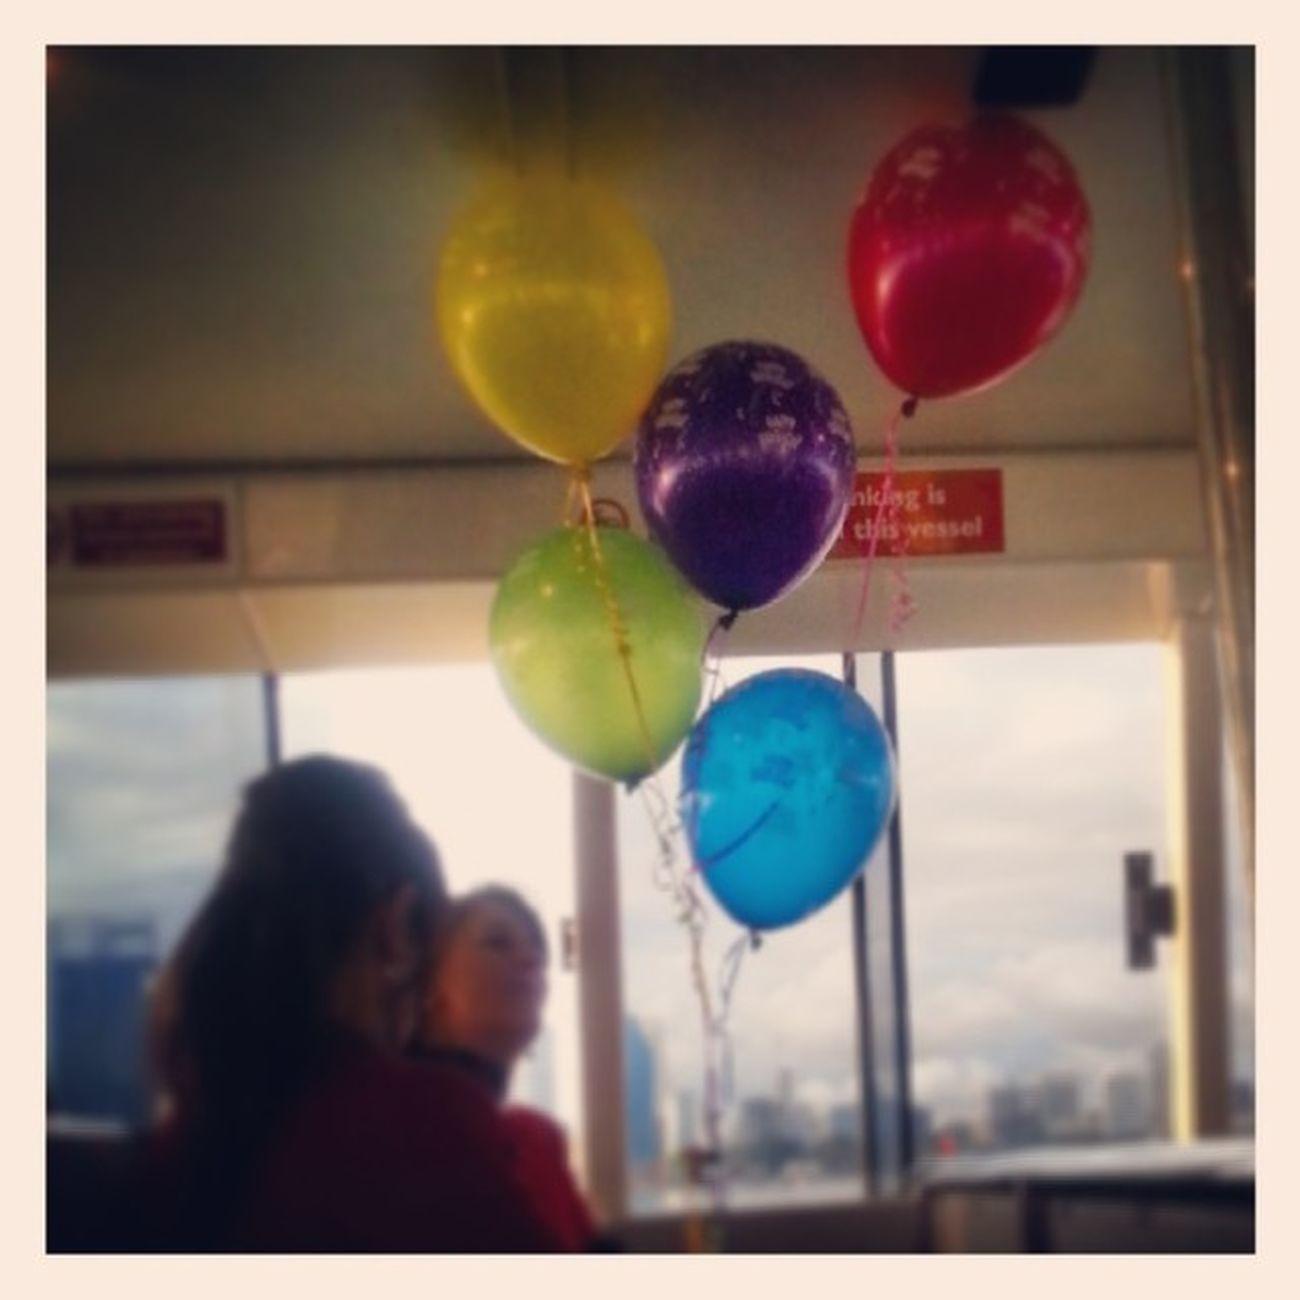 Happybirthdaytoyourandomladyontheferry Iloveballoons Perthlife Ferrylife